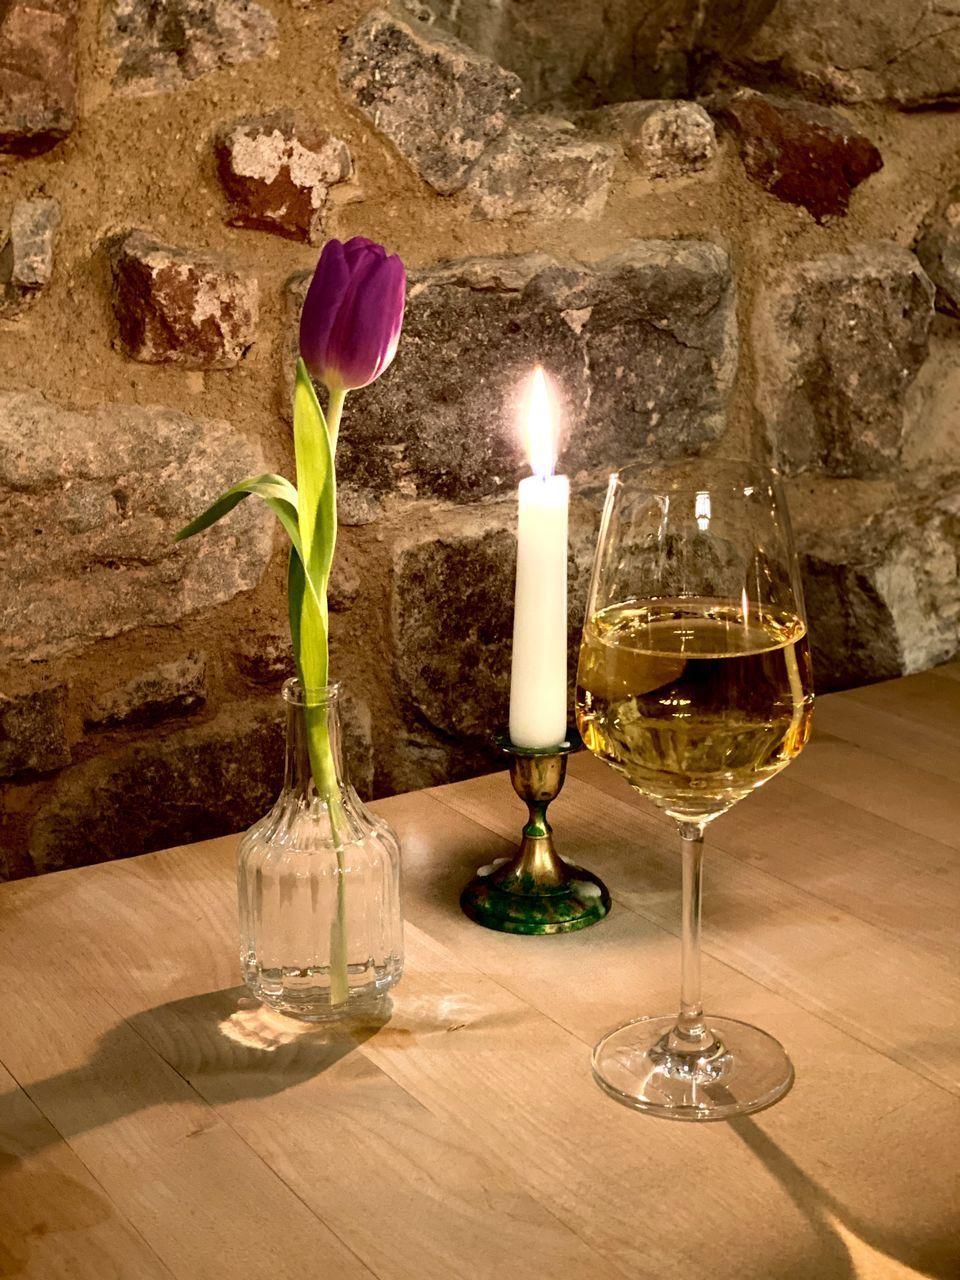 FLOWER VASE ON TABLE IN GLASS